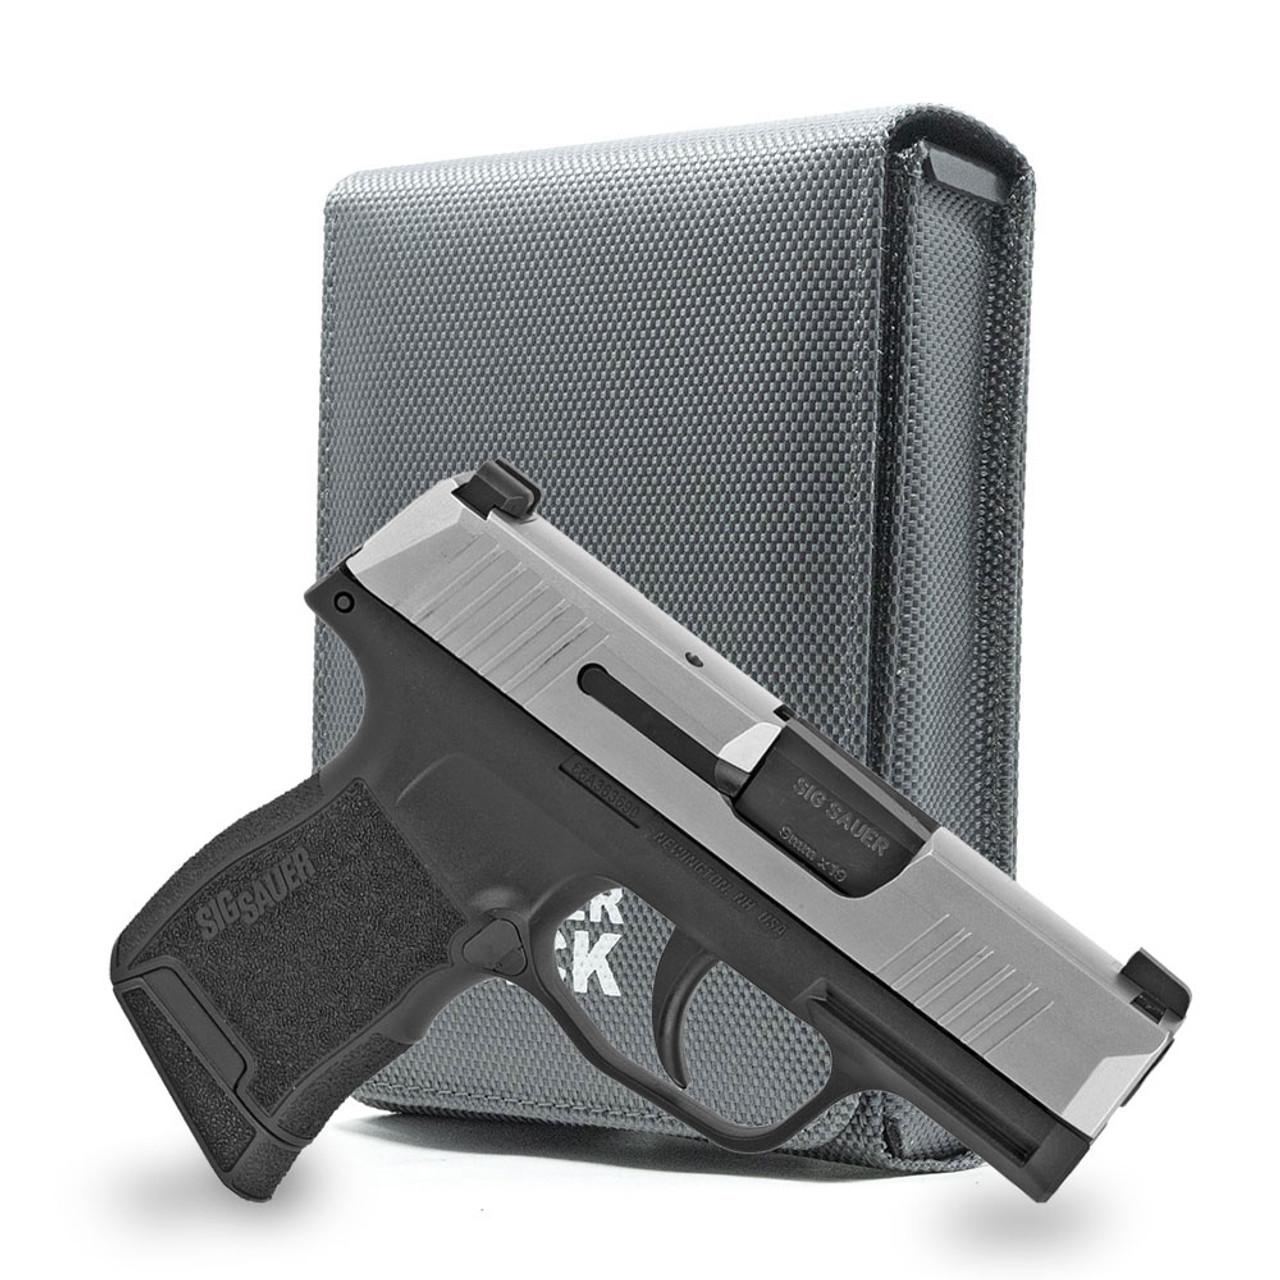 Sig P365 Grey Covert Series Holster